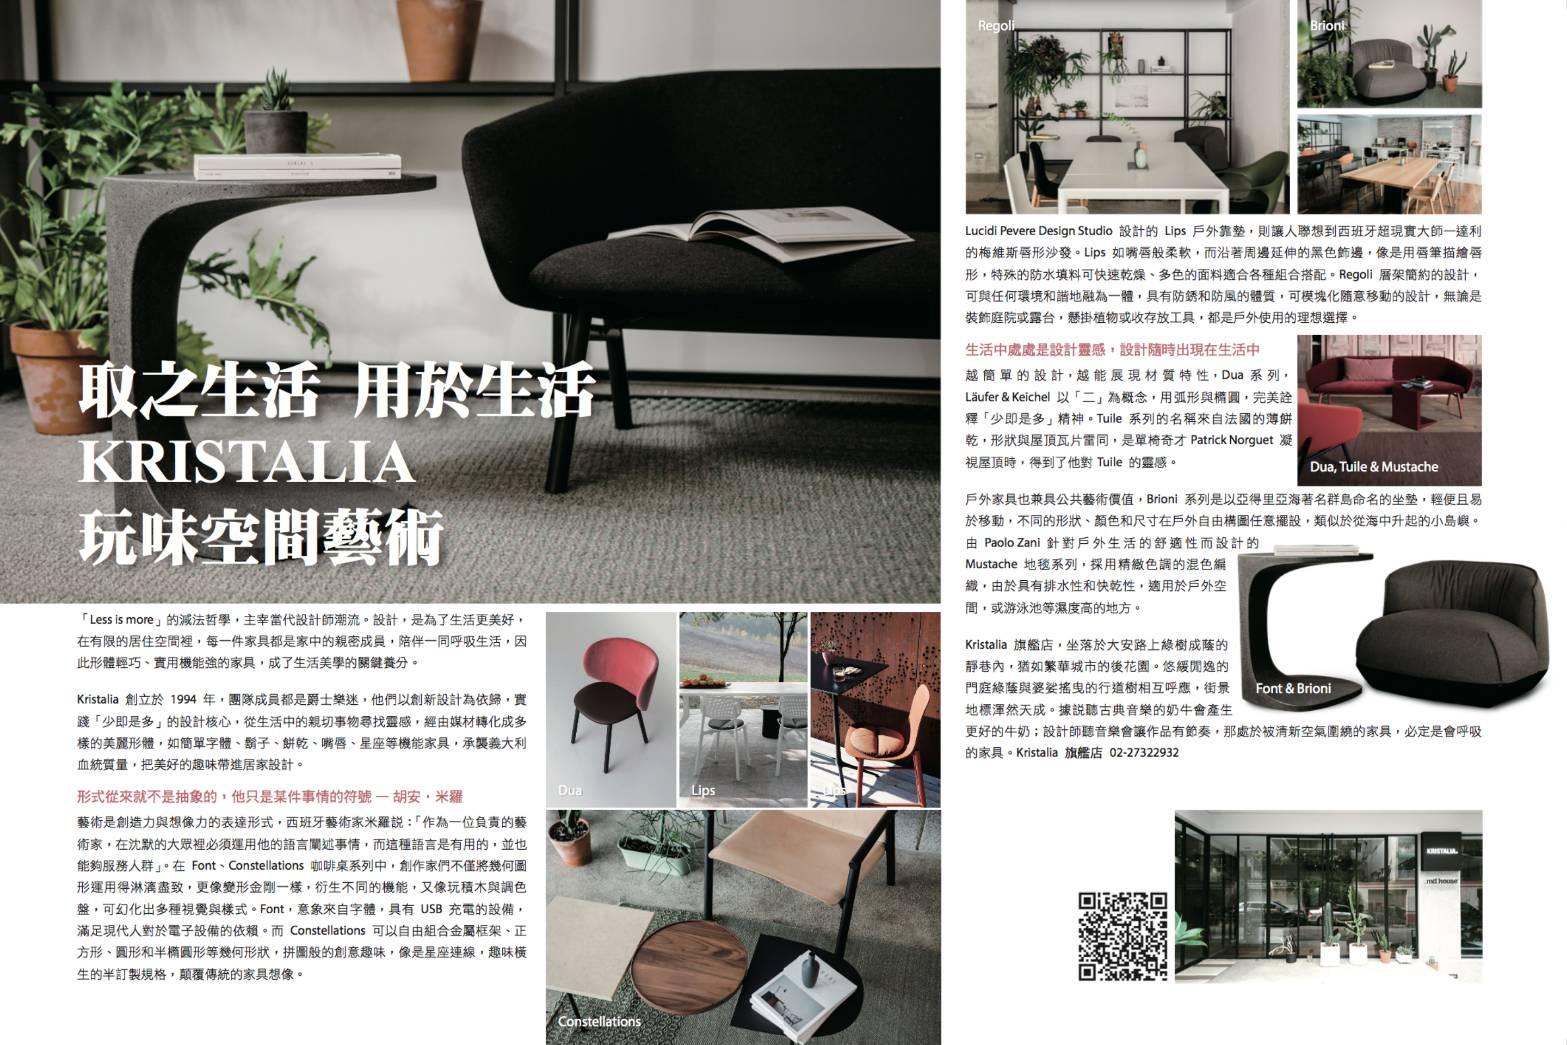 Kristalia 玩味空間藝術pdf.jpg